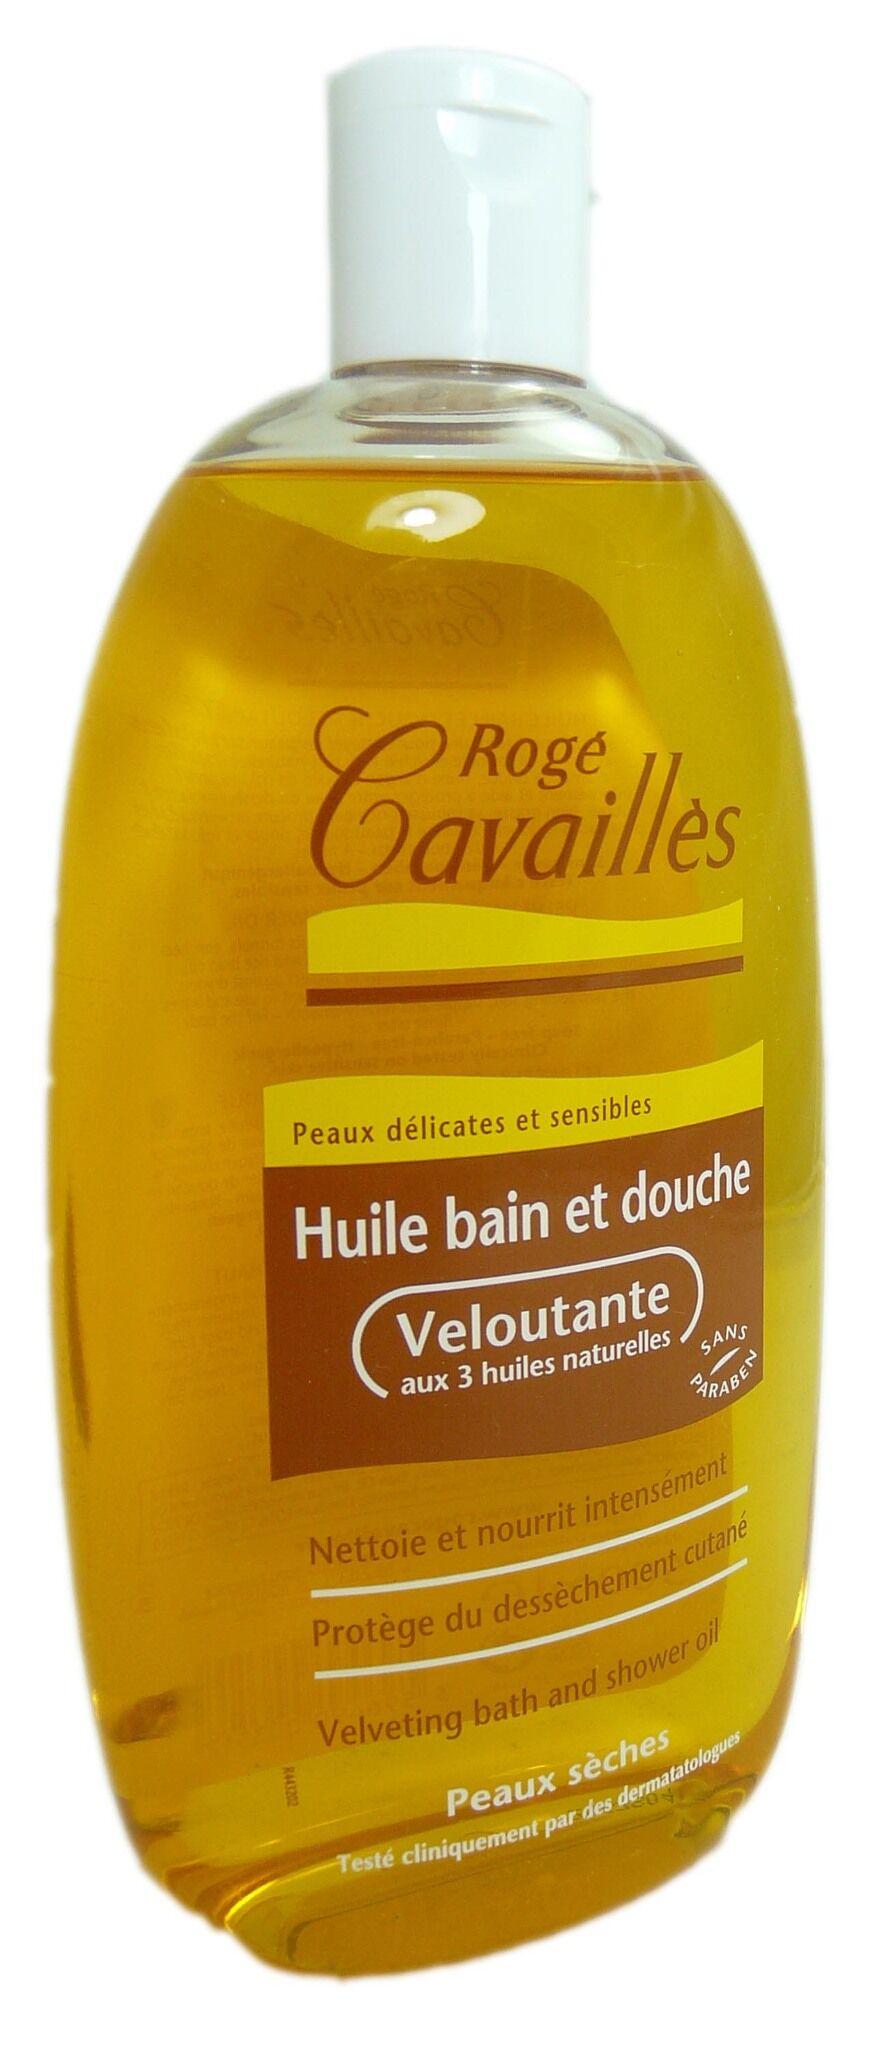 Roge cavailles huile bain douche 250ml